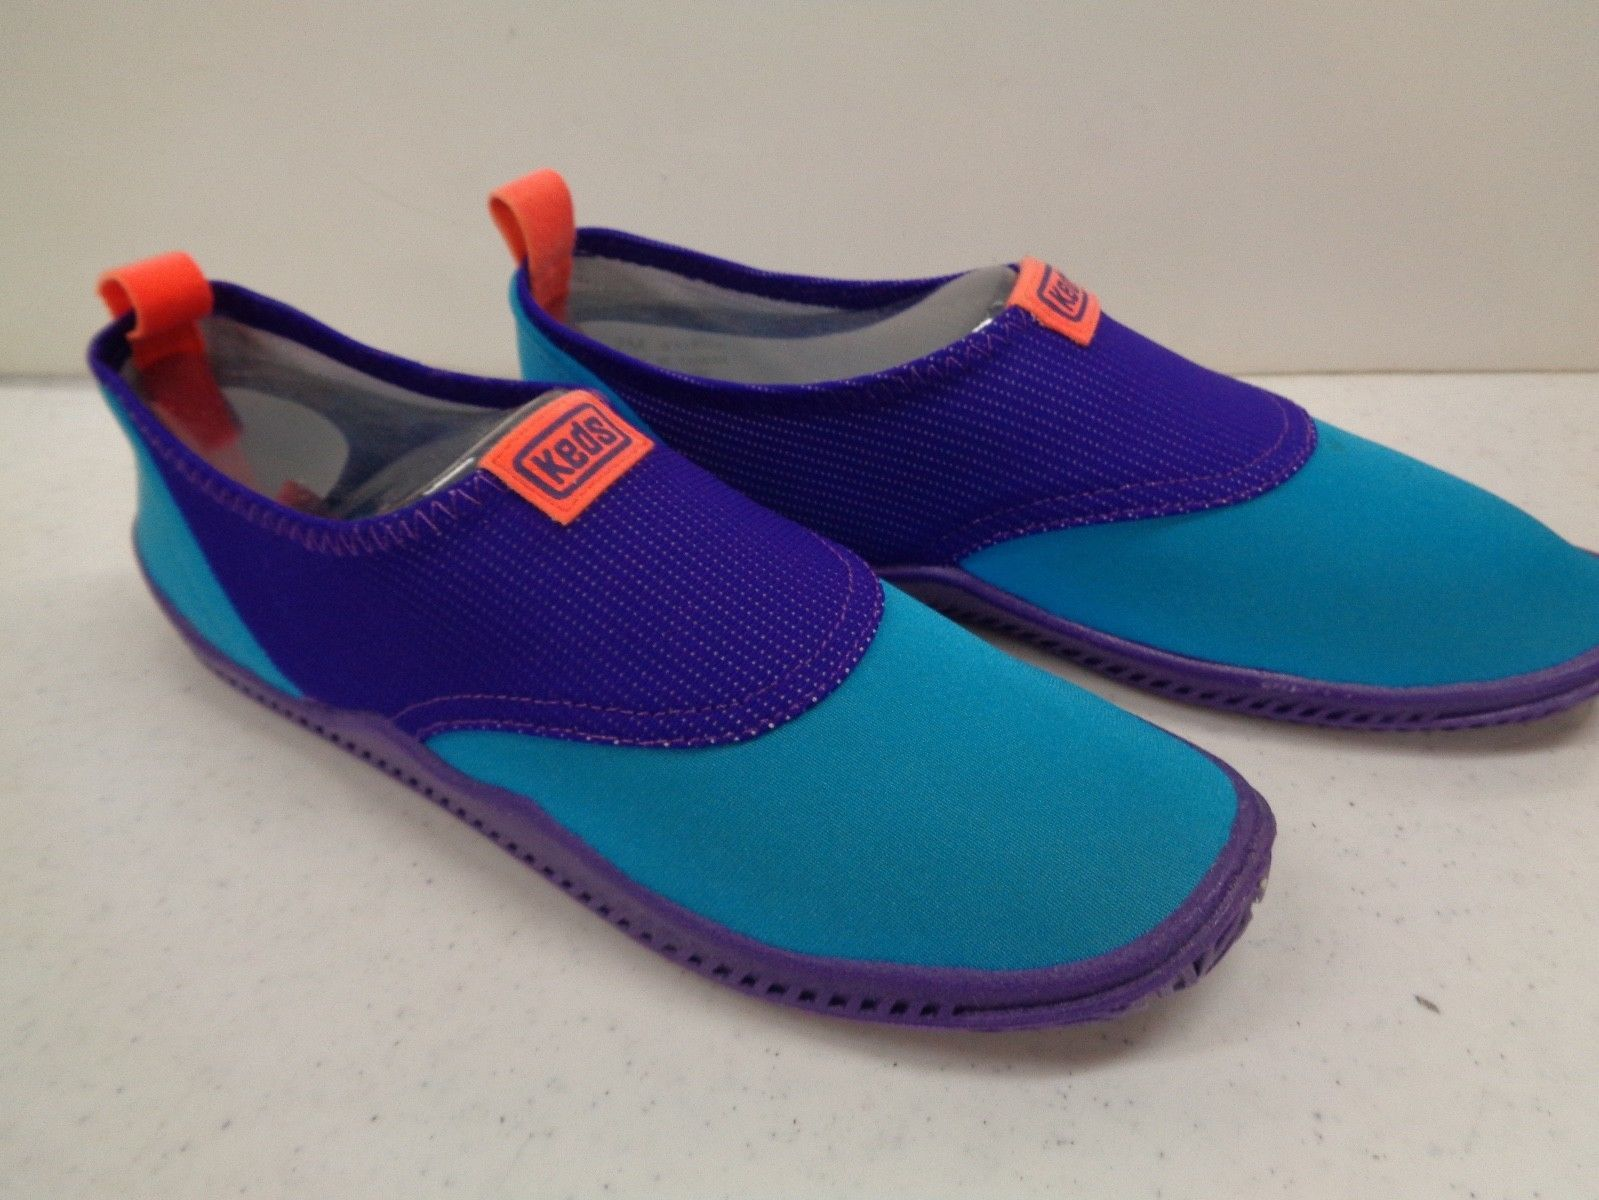 Keds RETRO Bright Skinny Dippers Women Beach Sock Blue & Purple Water Shoes NIB